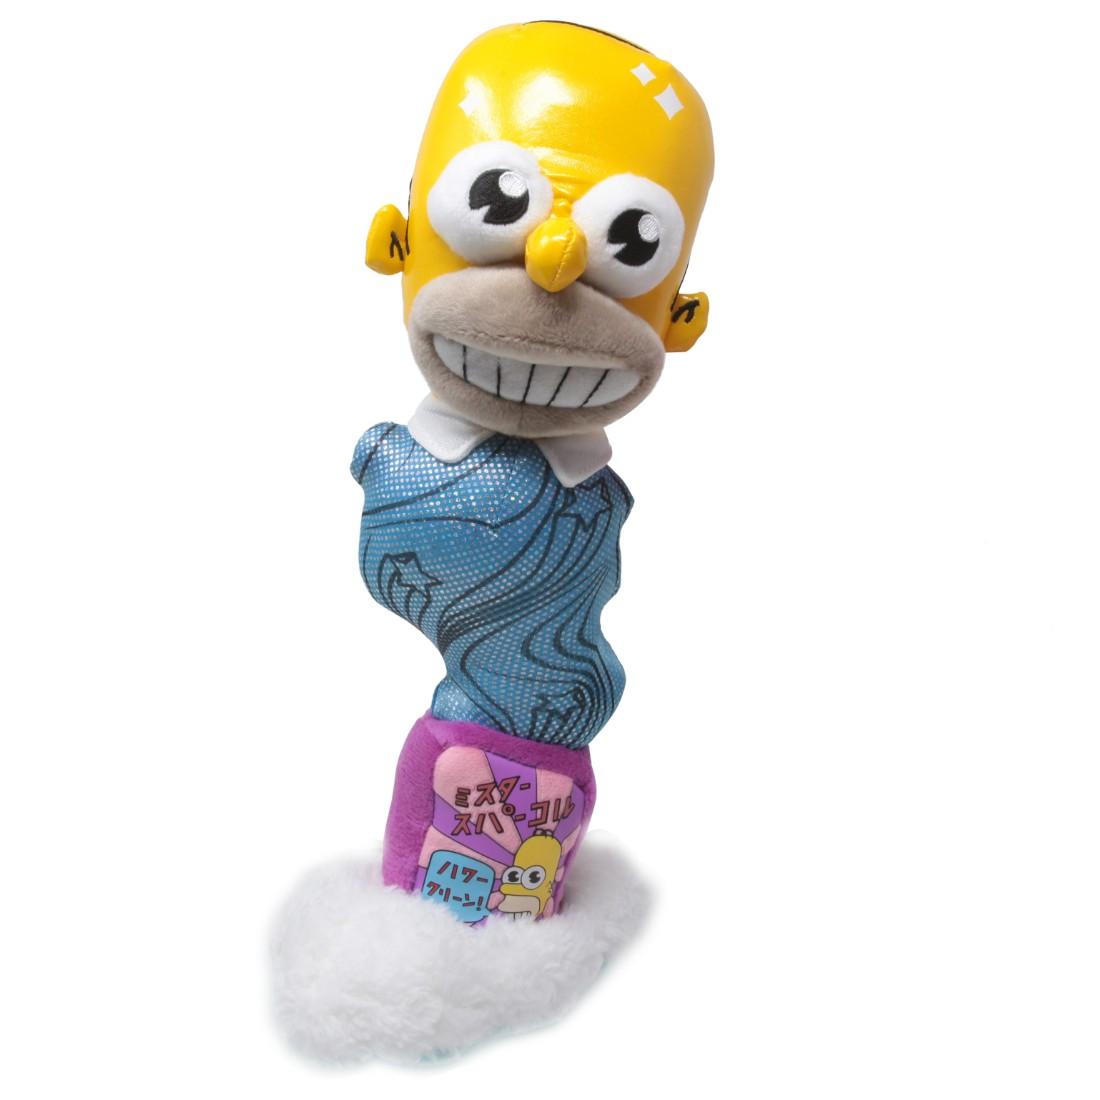 Kidrobot x The Simpsons Mr. Sparkle 11 Inch Plush (blue)